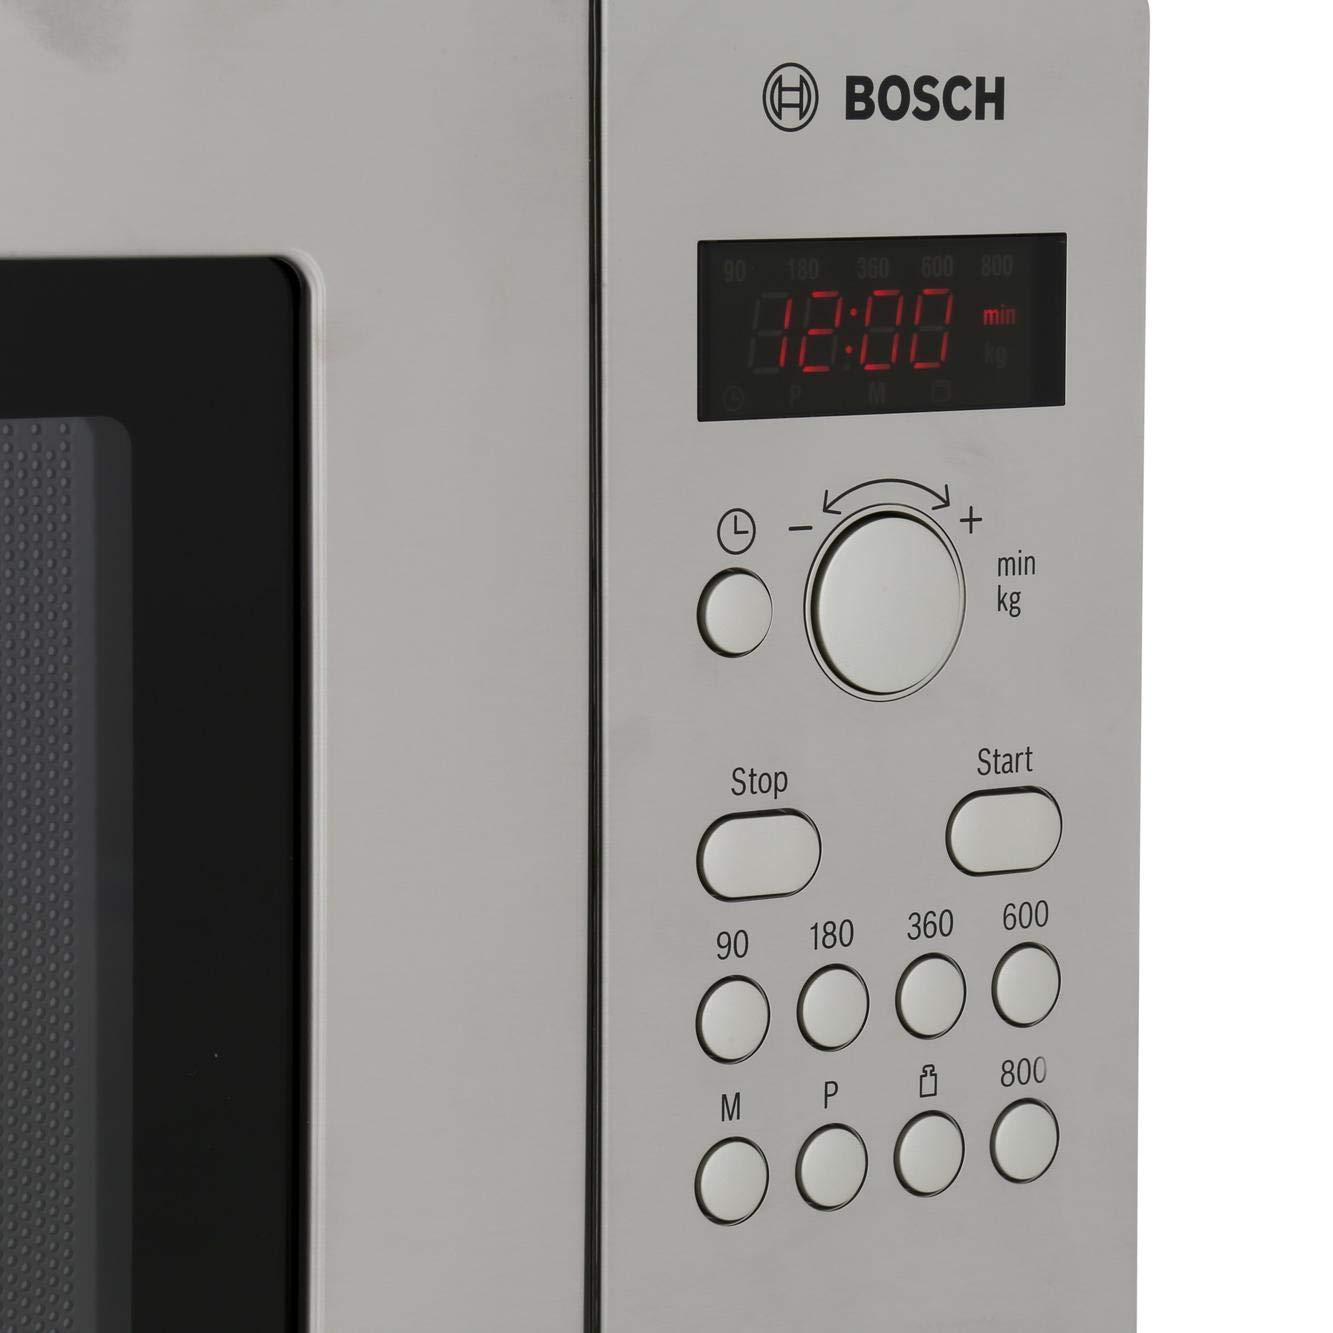 Bosch HMT75M451B, Acero inoxidable, 462 x 320 x 280 mm, LED - Microondas (importado de Inglaterra)